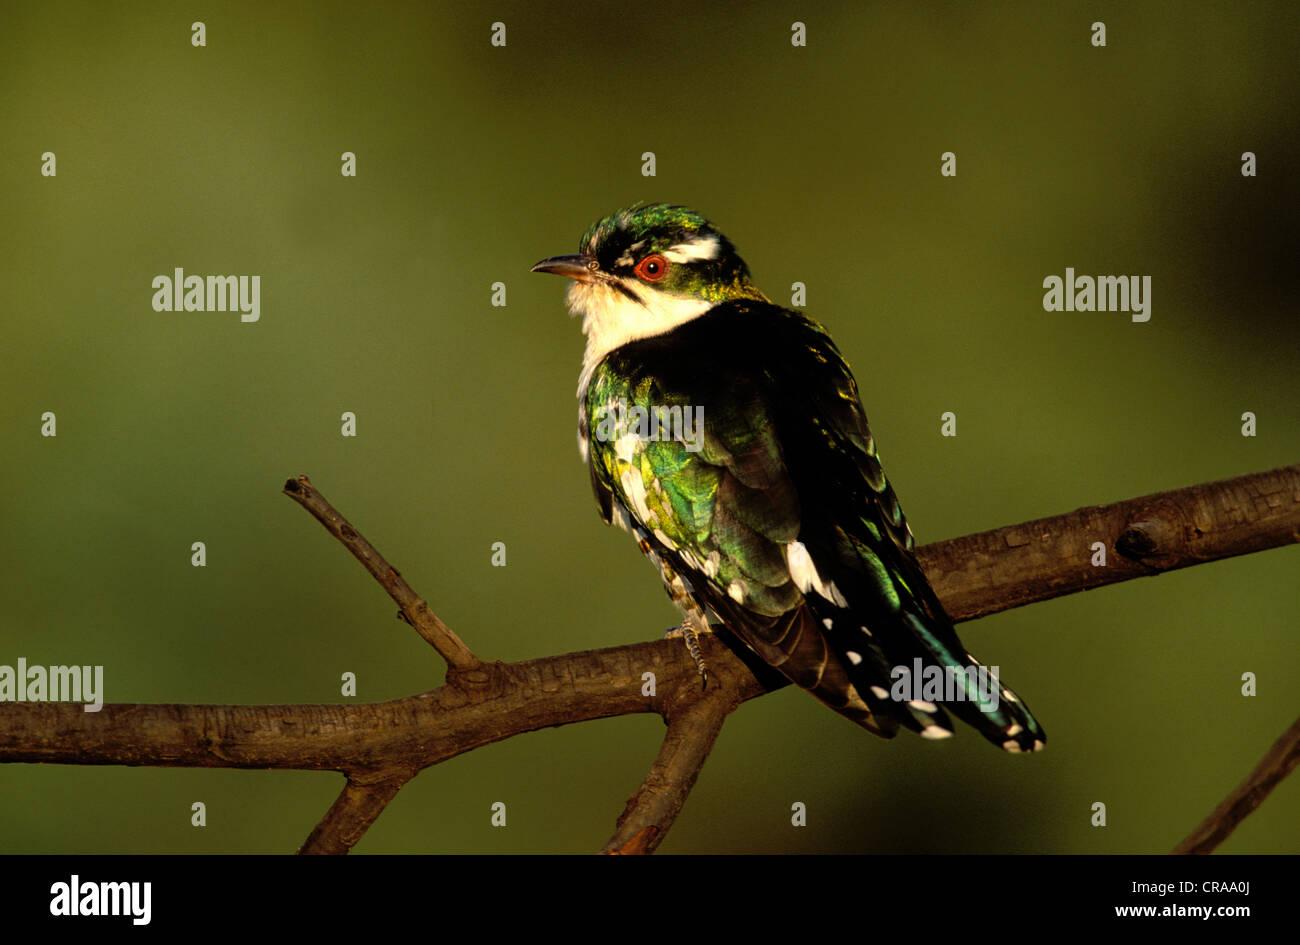 Diderik Cuckoo (Chrysococcyx caprius), KwaZulu-Natal, South Africa - Stock Image